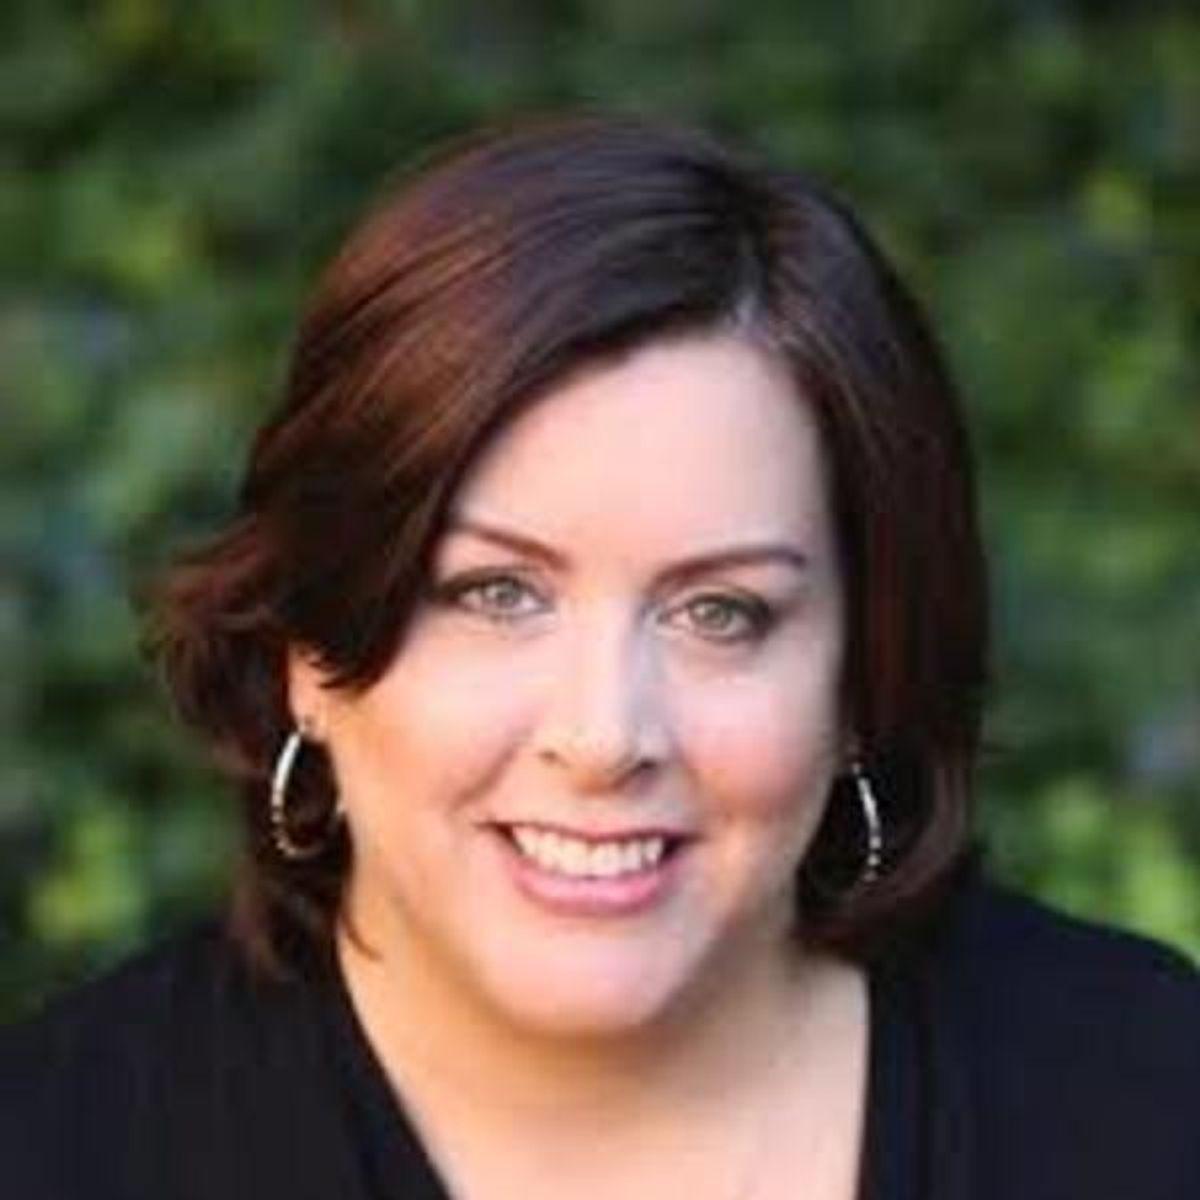 Photo of Kim Seals, General Partner at The JumpFund